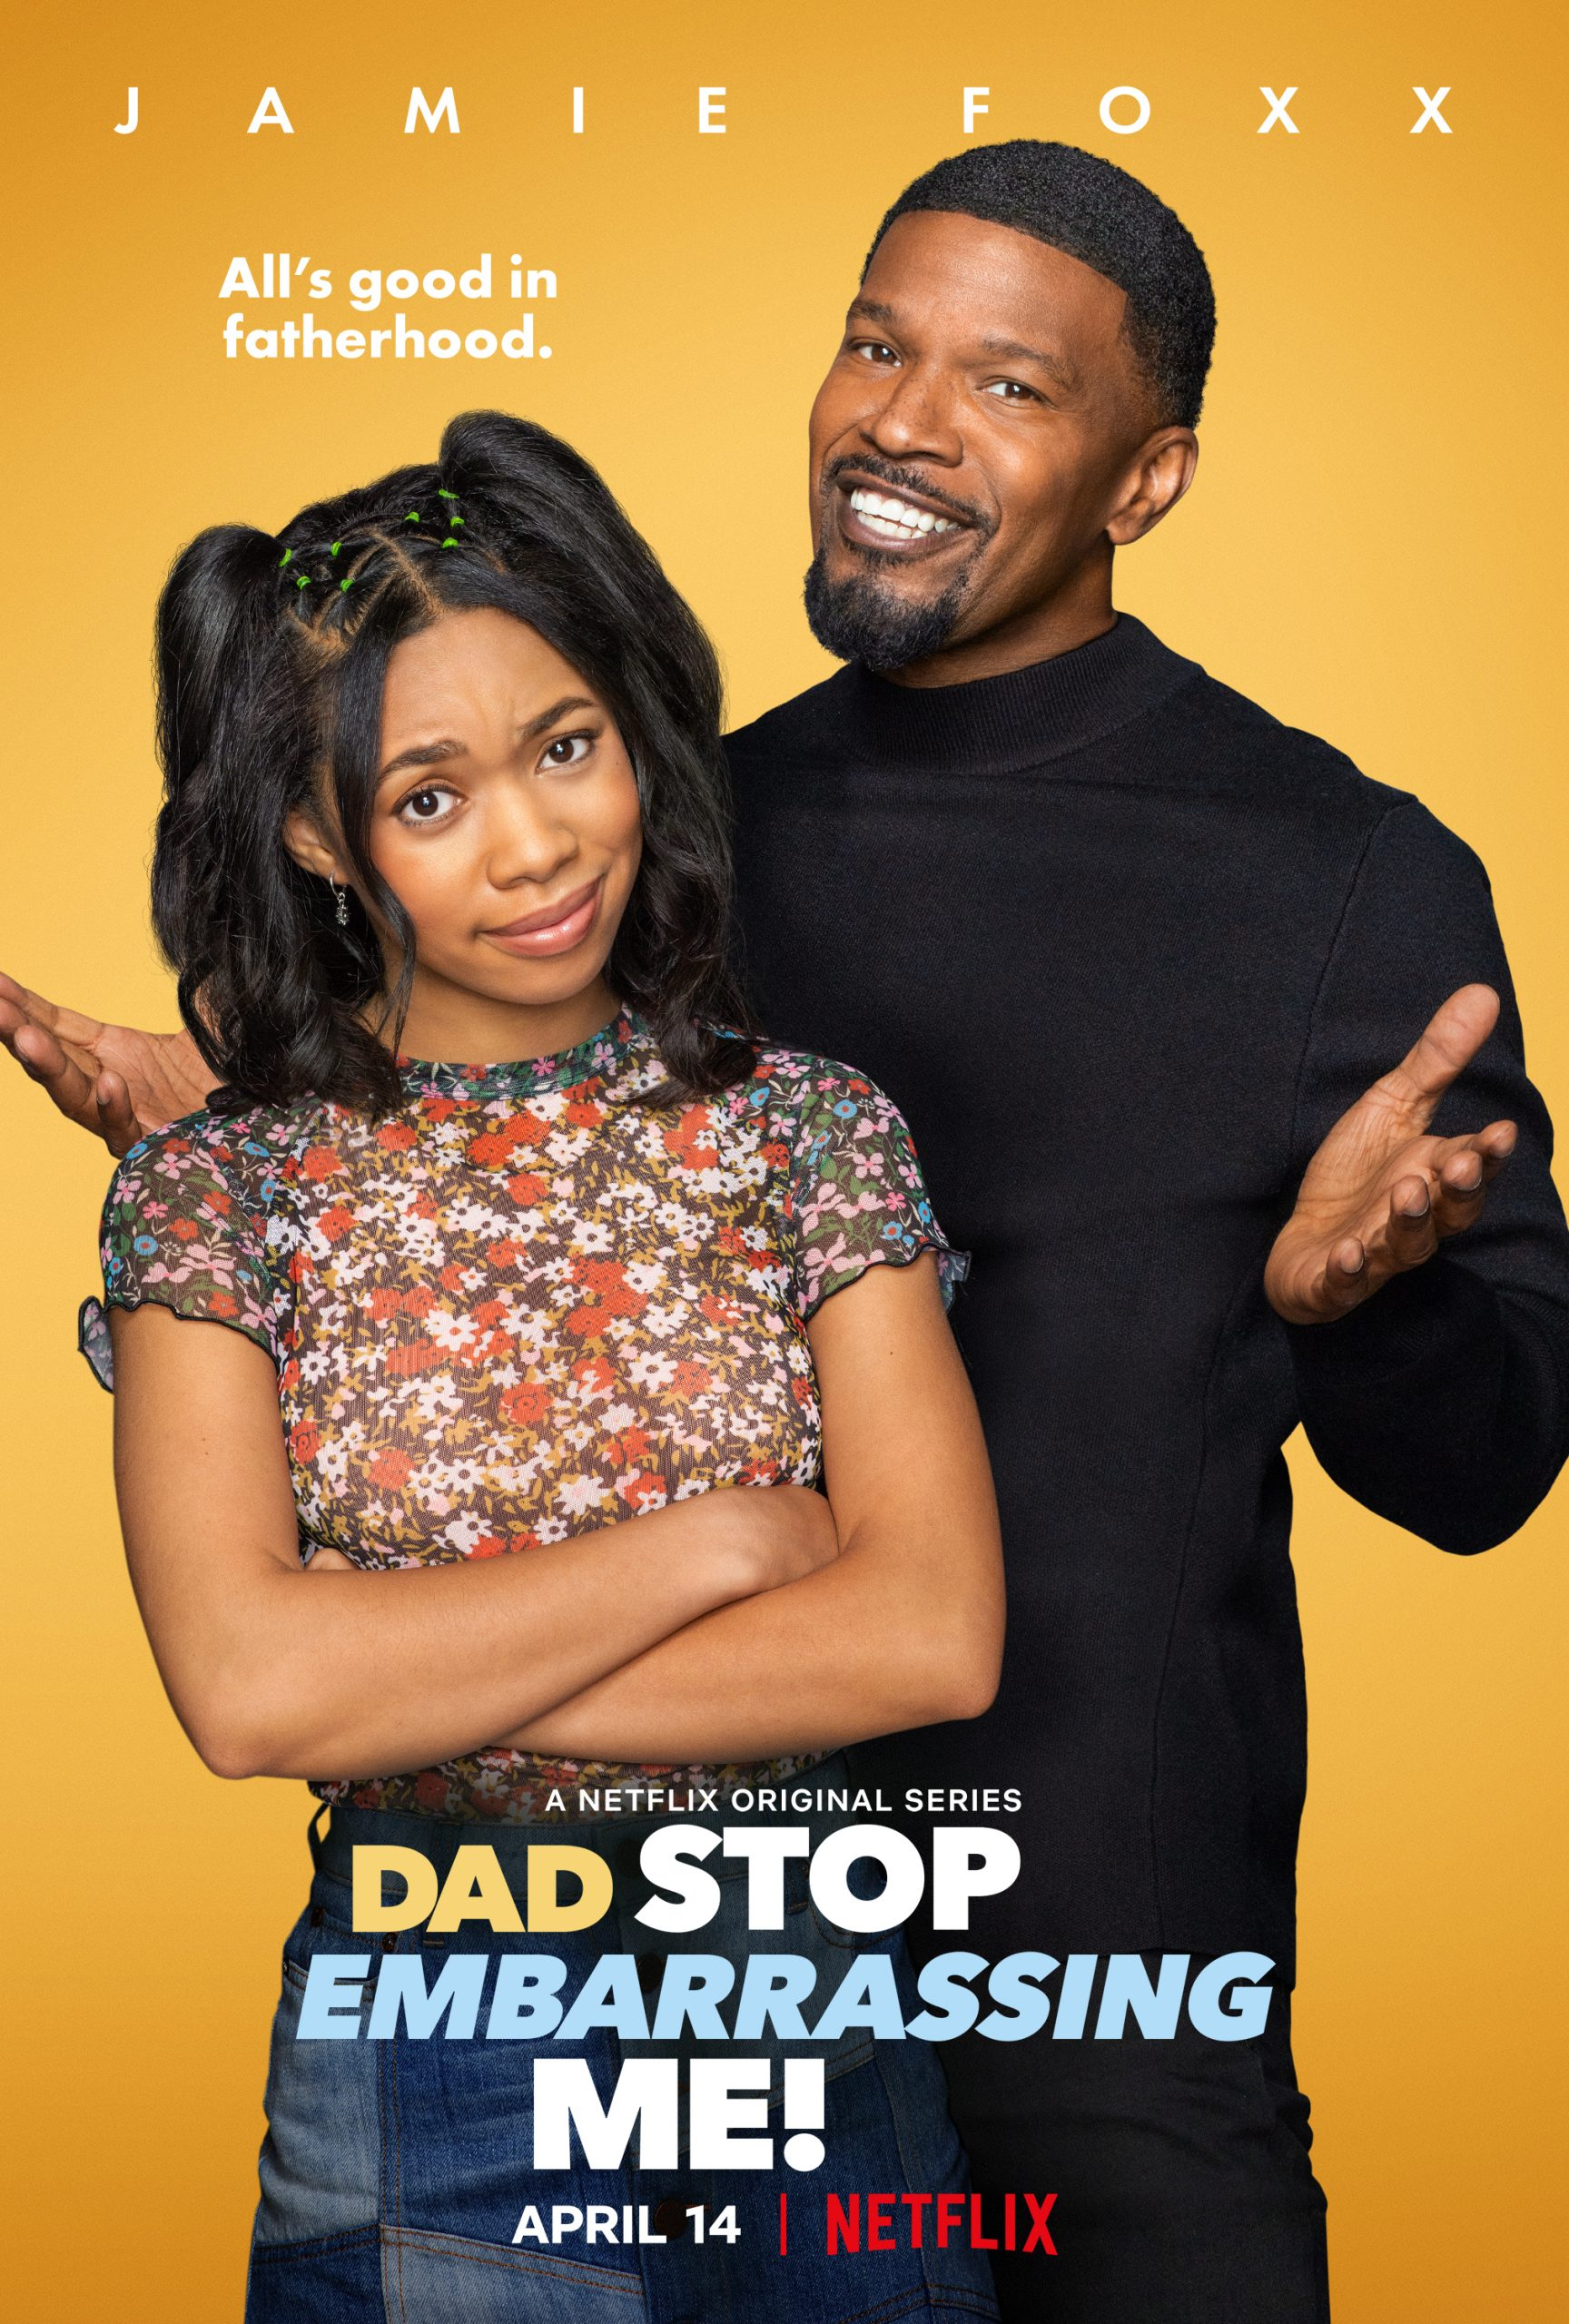 New Show: Netflix's 'Dad Stop Embarrassing Me!' Starring Jamie Foxx